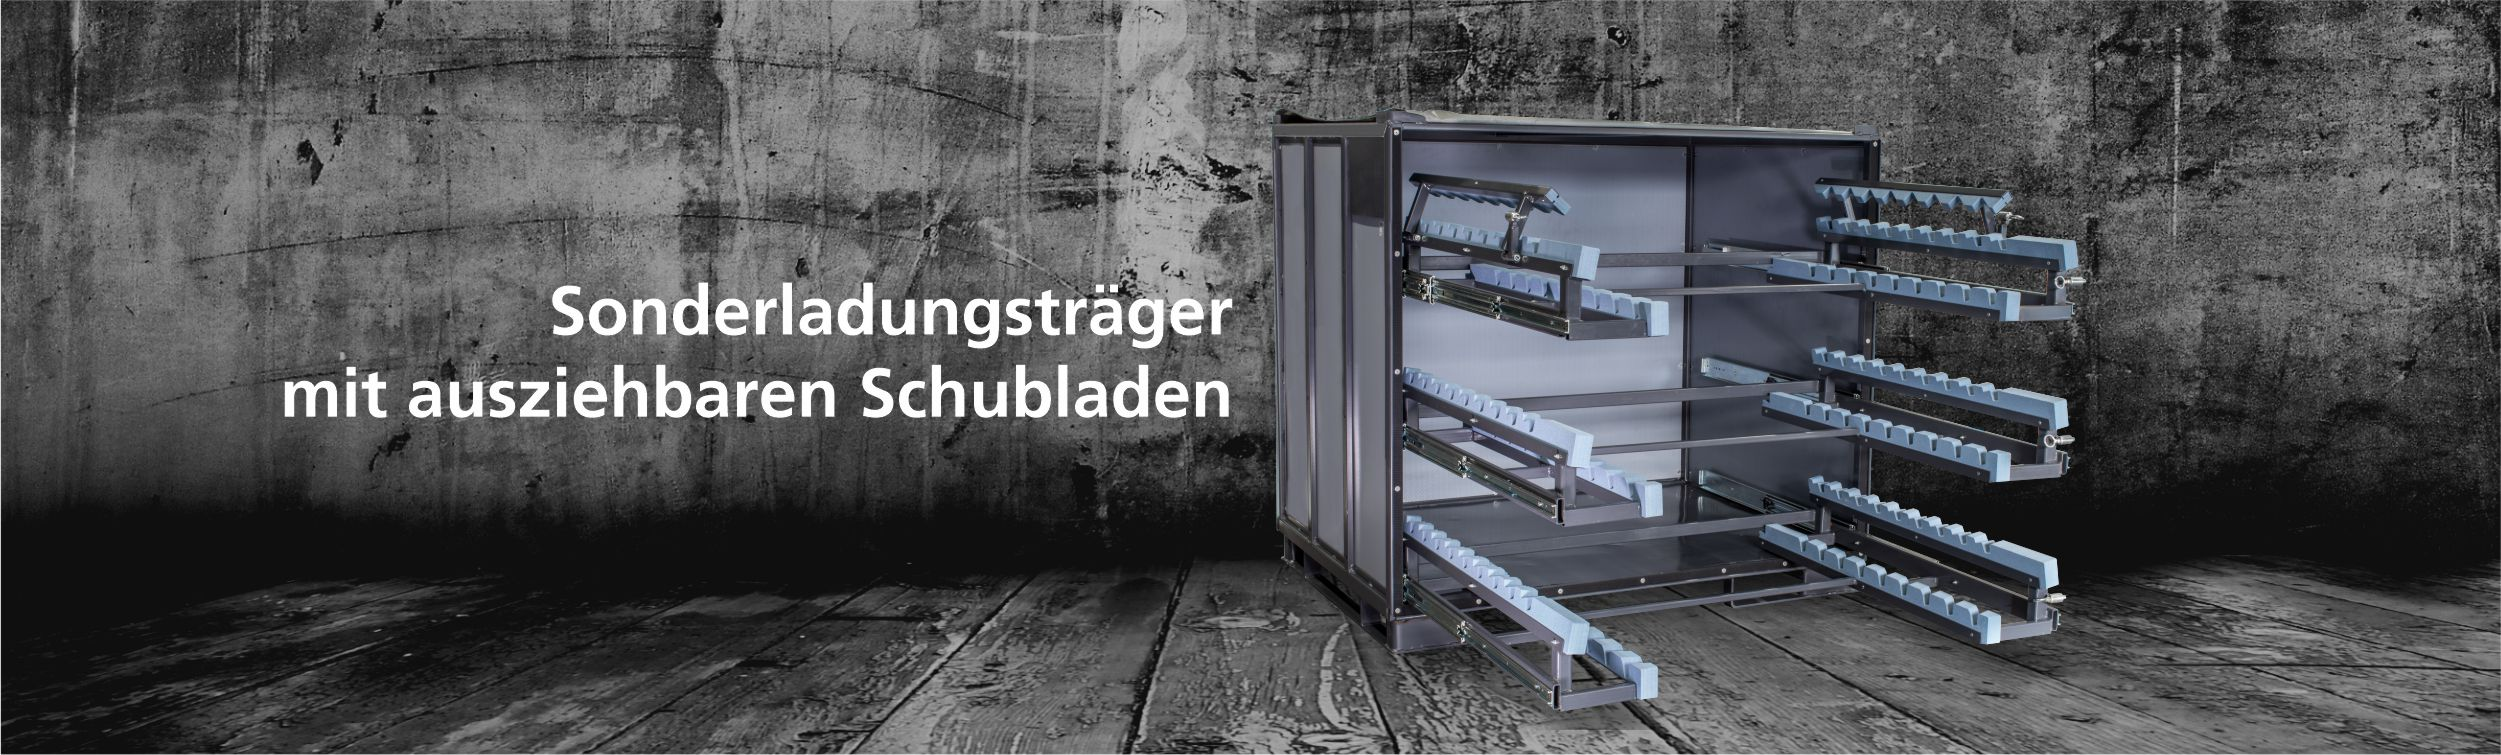 sonderladungstraeger_schubladen